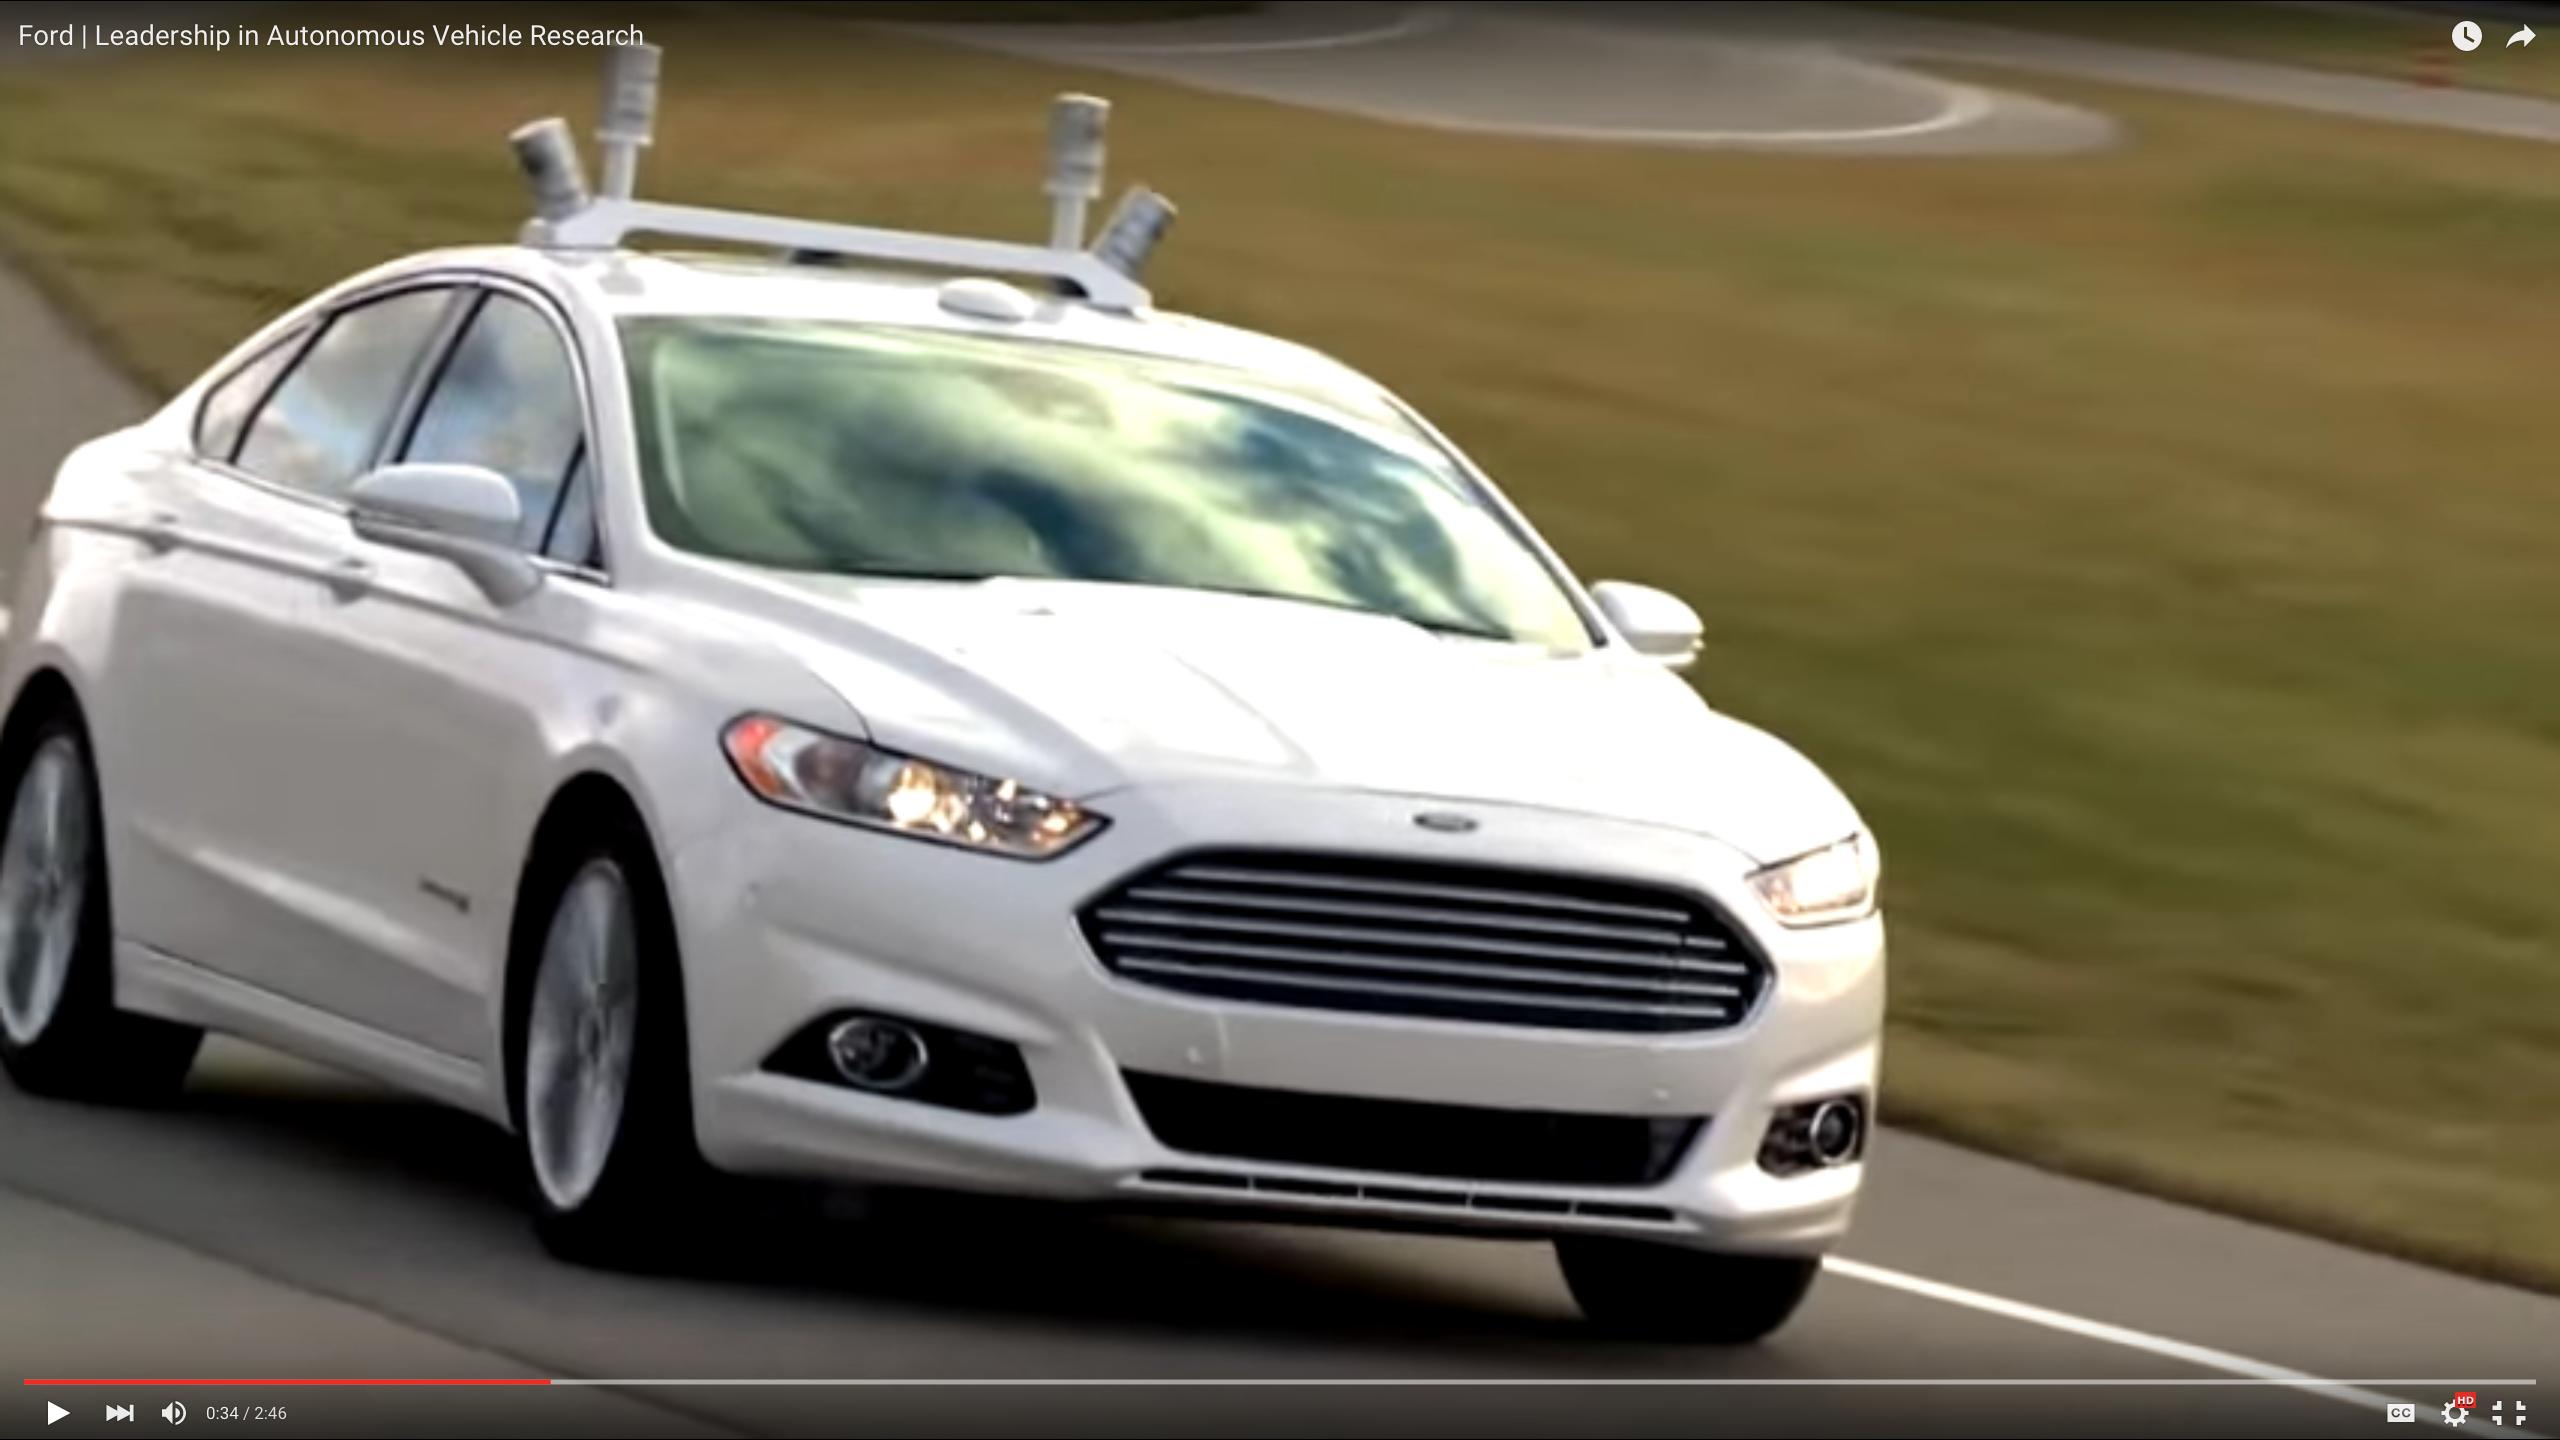 Ford's Autonomous Car Progress